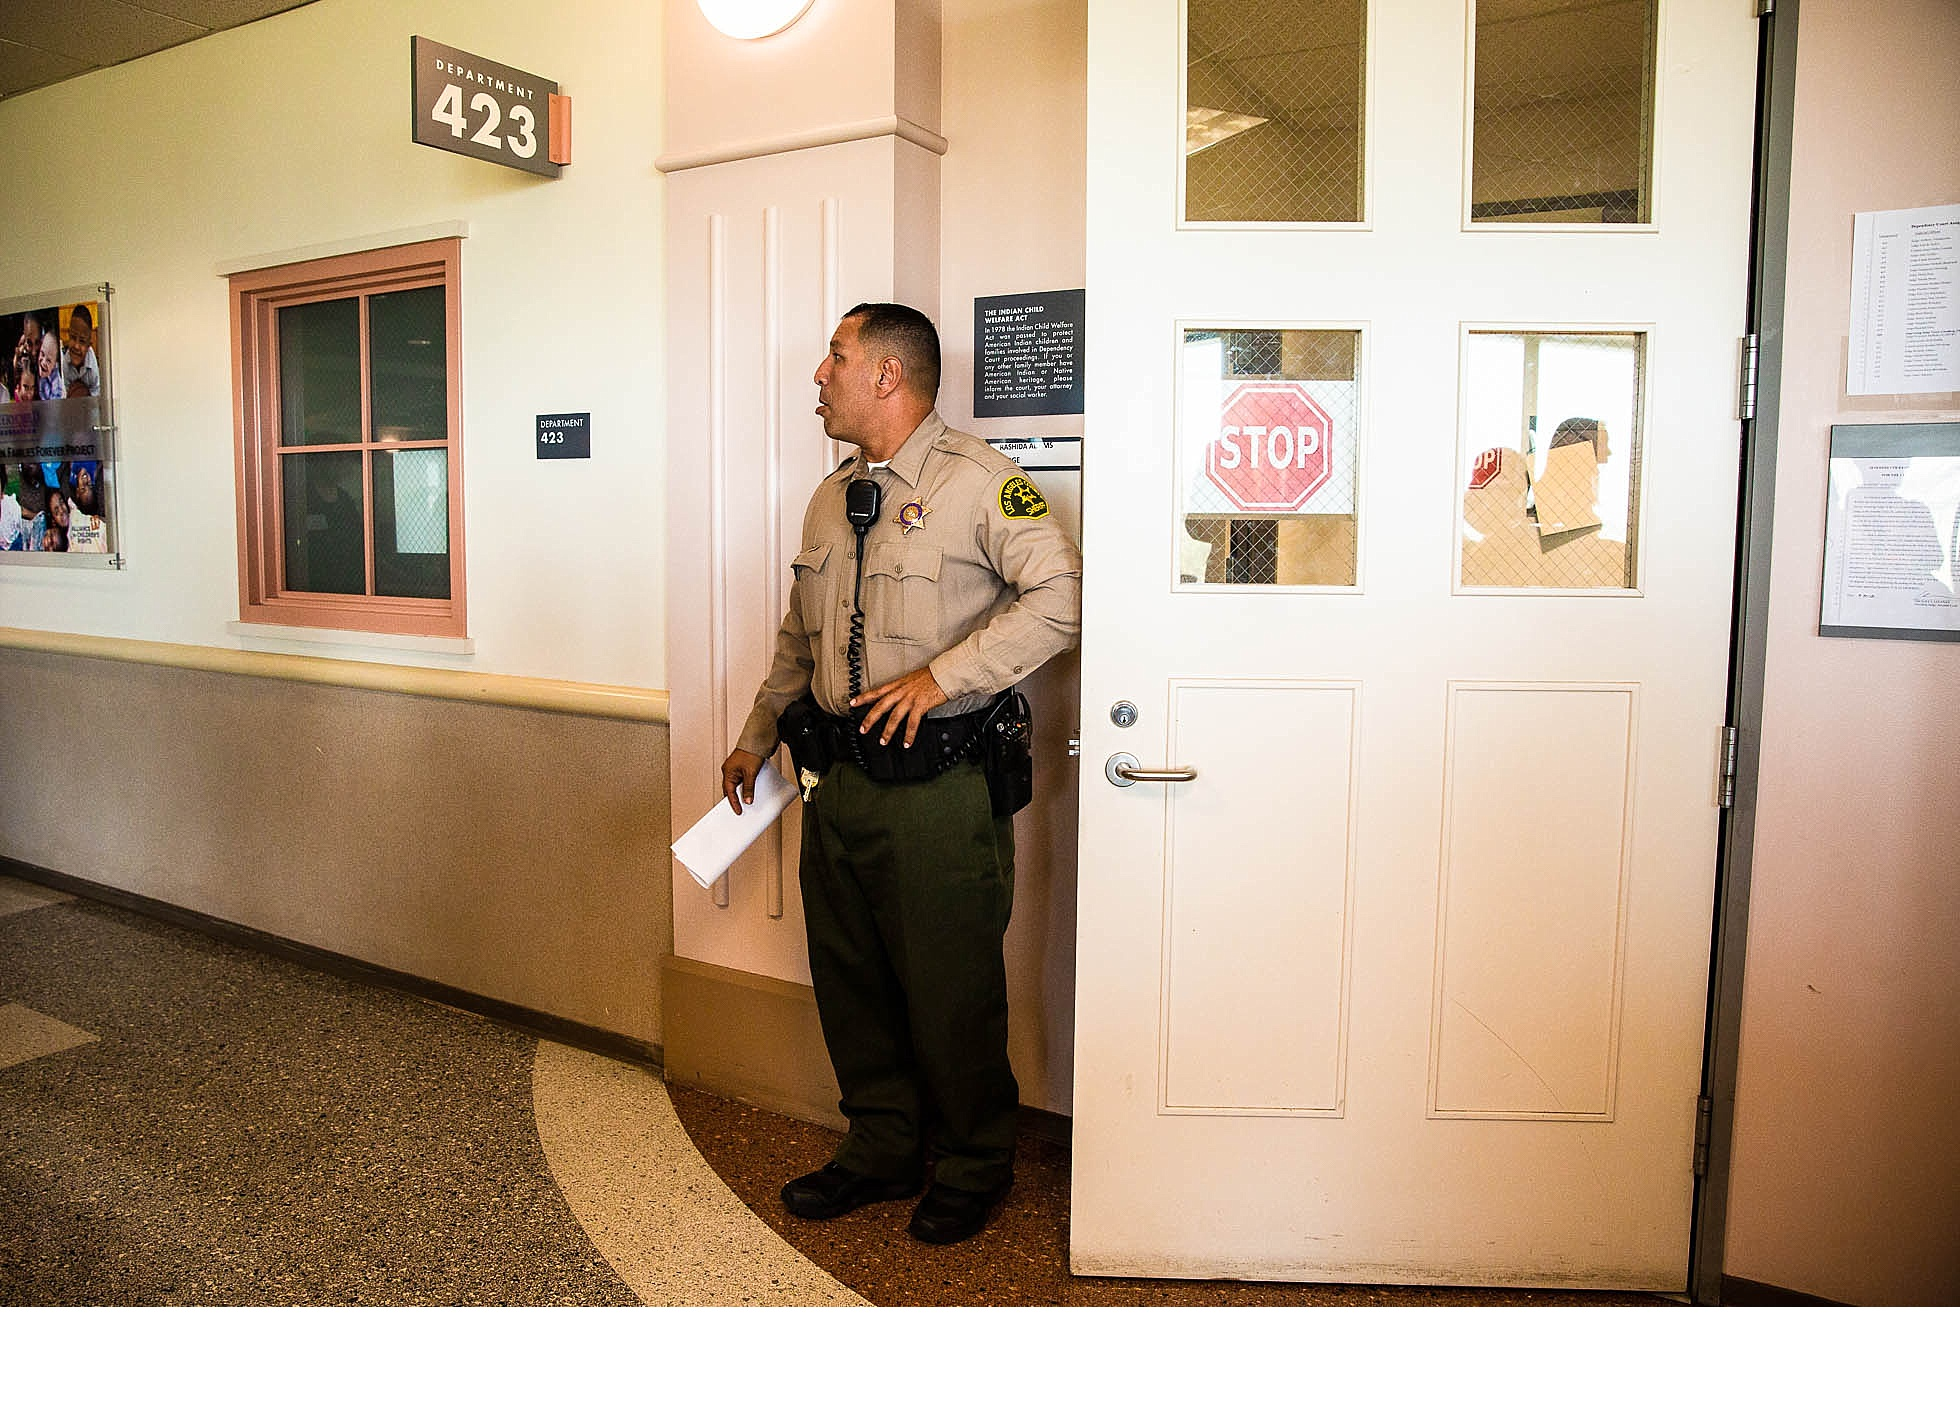 sally-ann-field-adoption-finalization-LA-heart-gallery-childrens-courthouse-mother-son-12.jpg